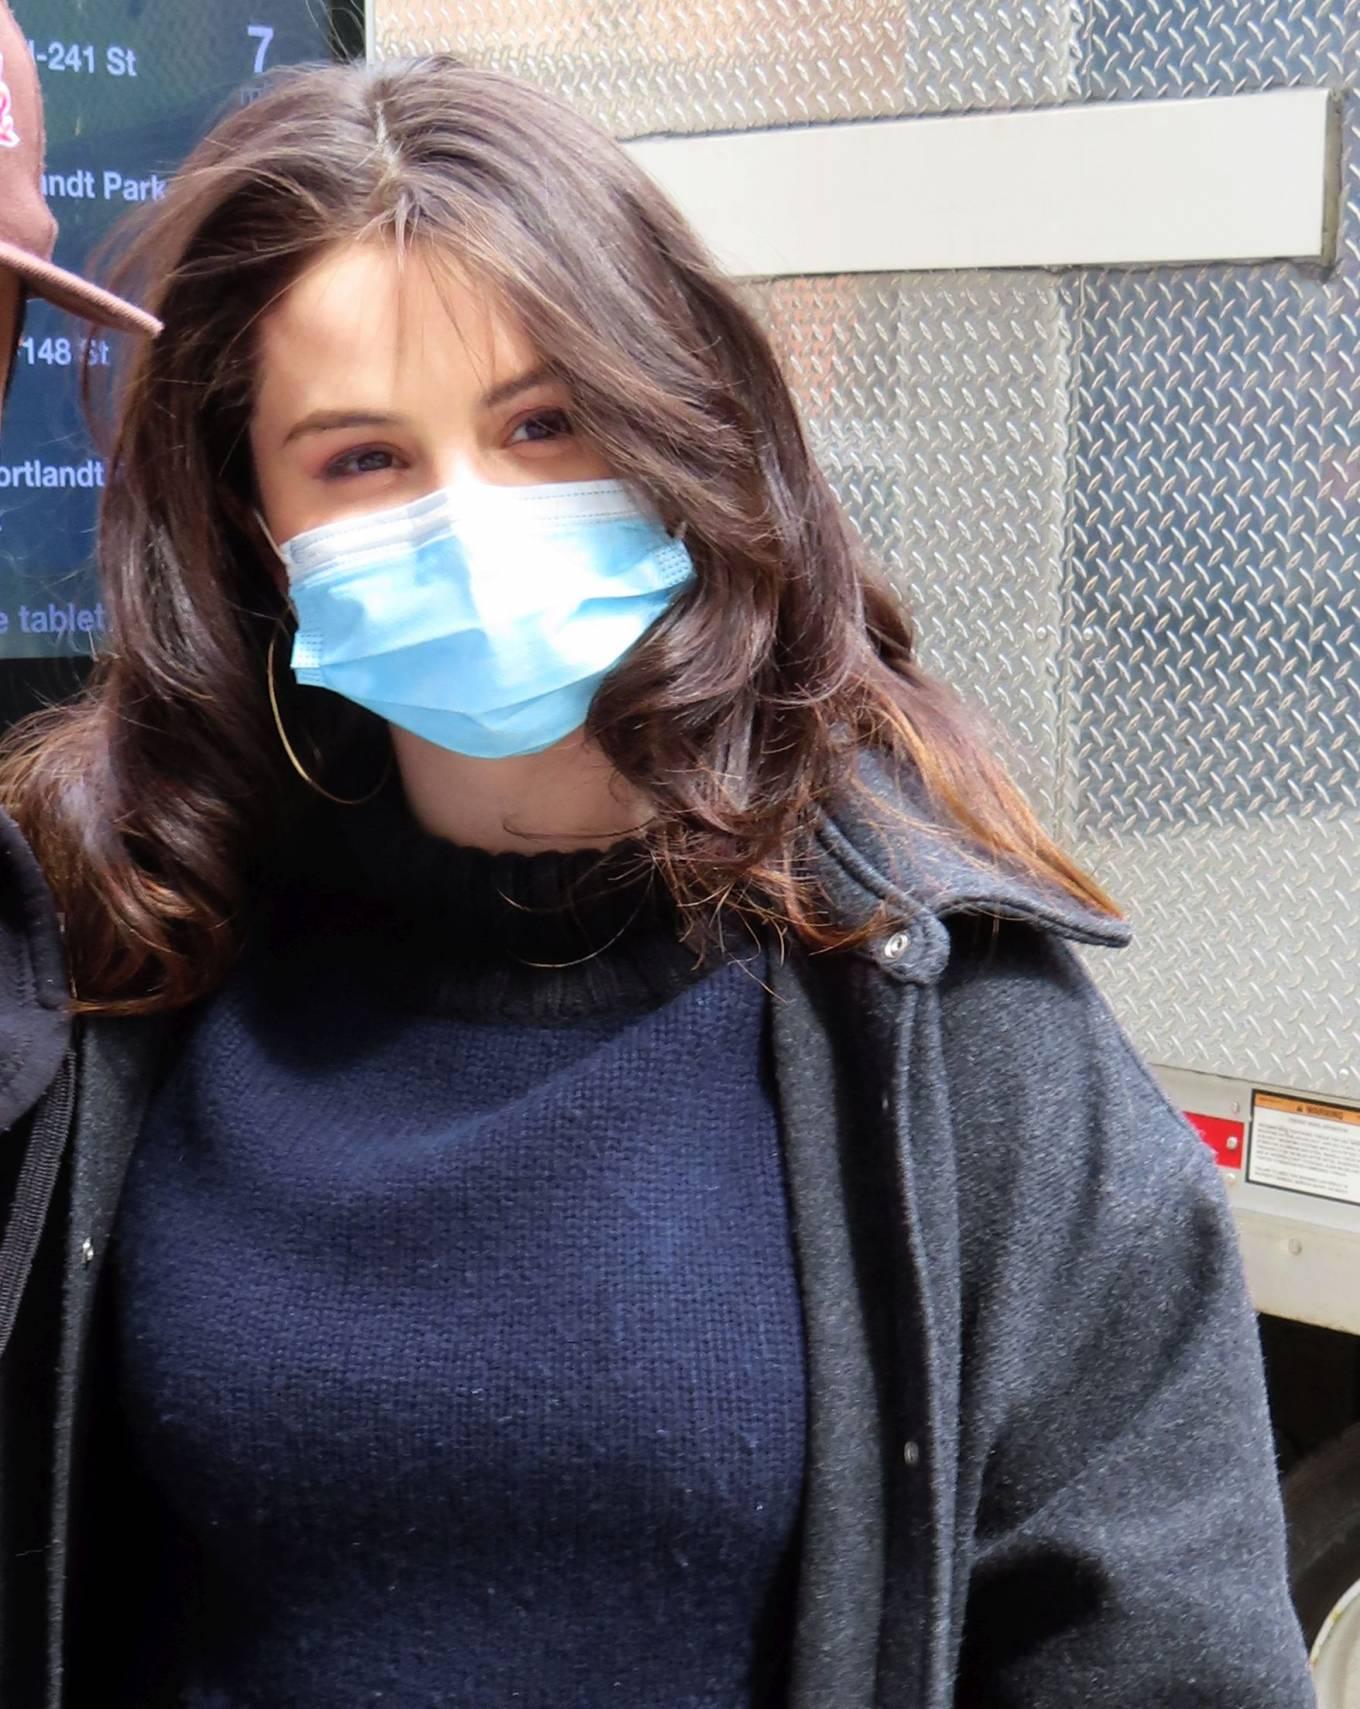 Selena Gomez 2021 : Selena Gomez – On film set at West End area in New York City-15